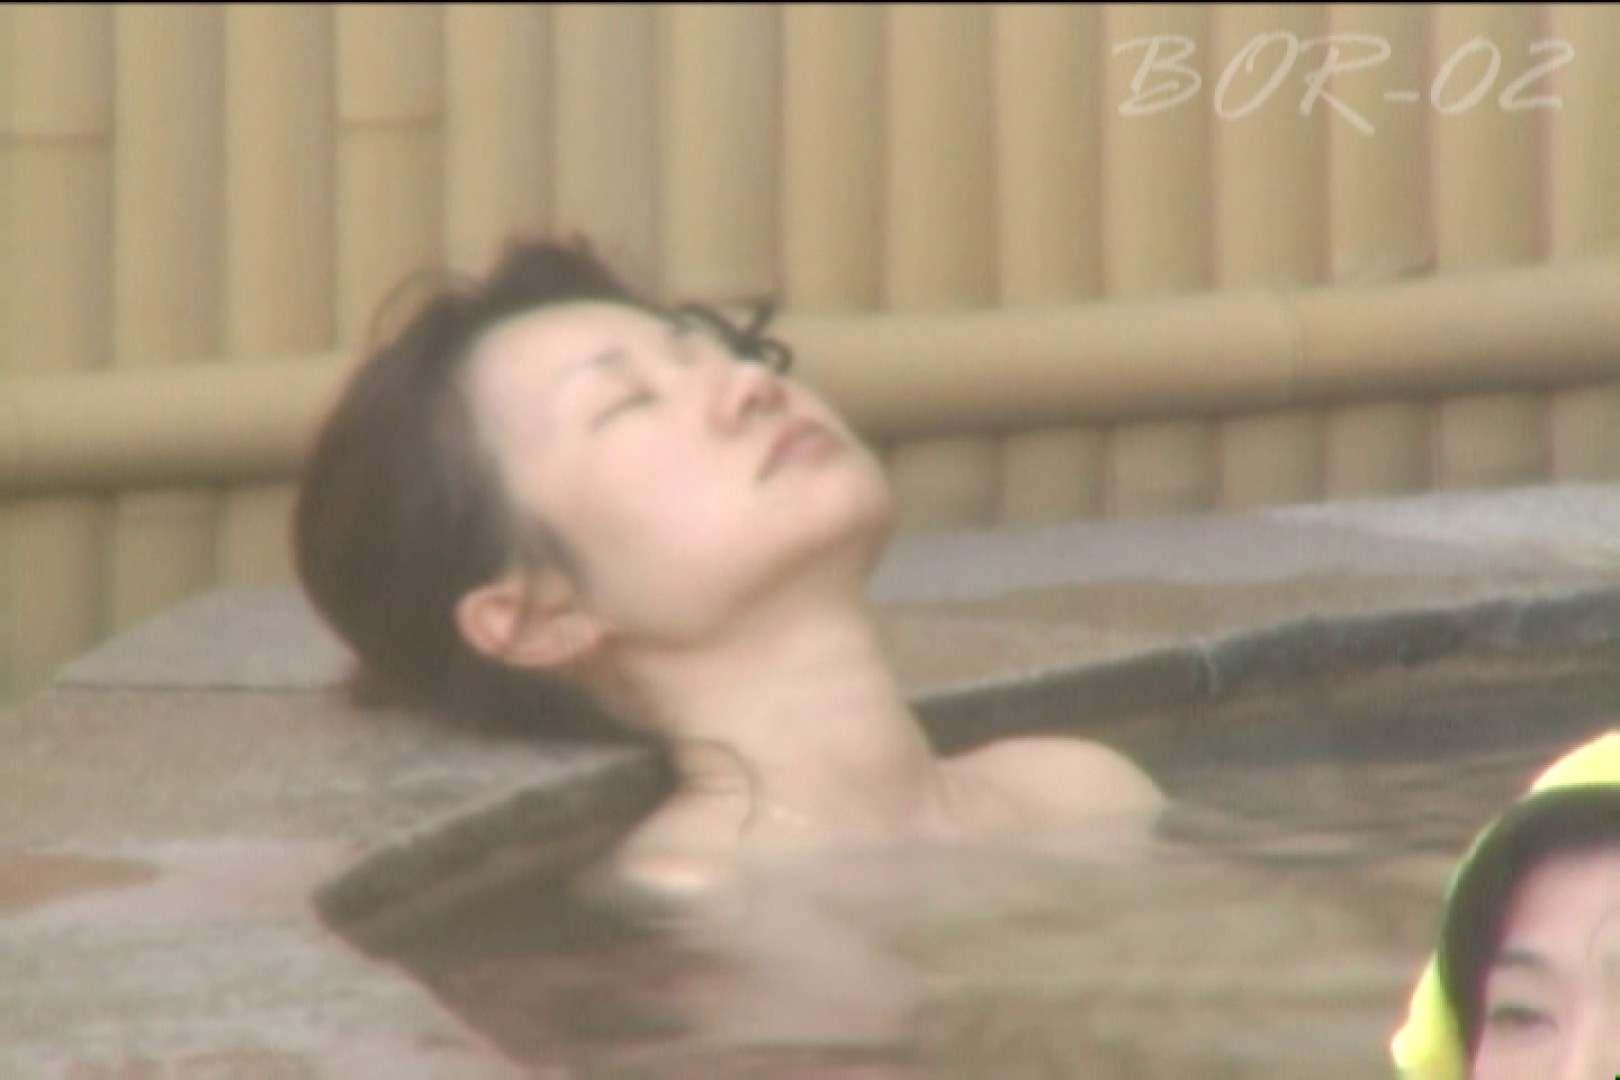 Aquaな露天風呂Vol.477 0  28連発 10